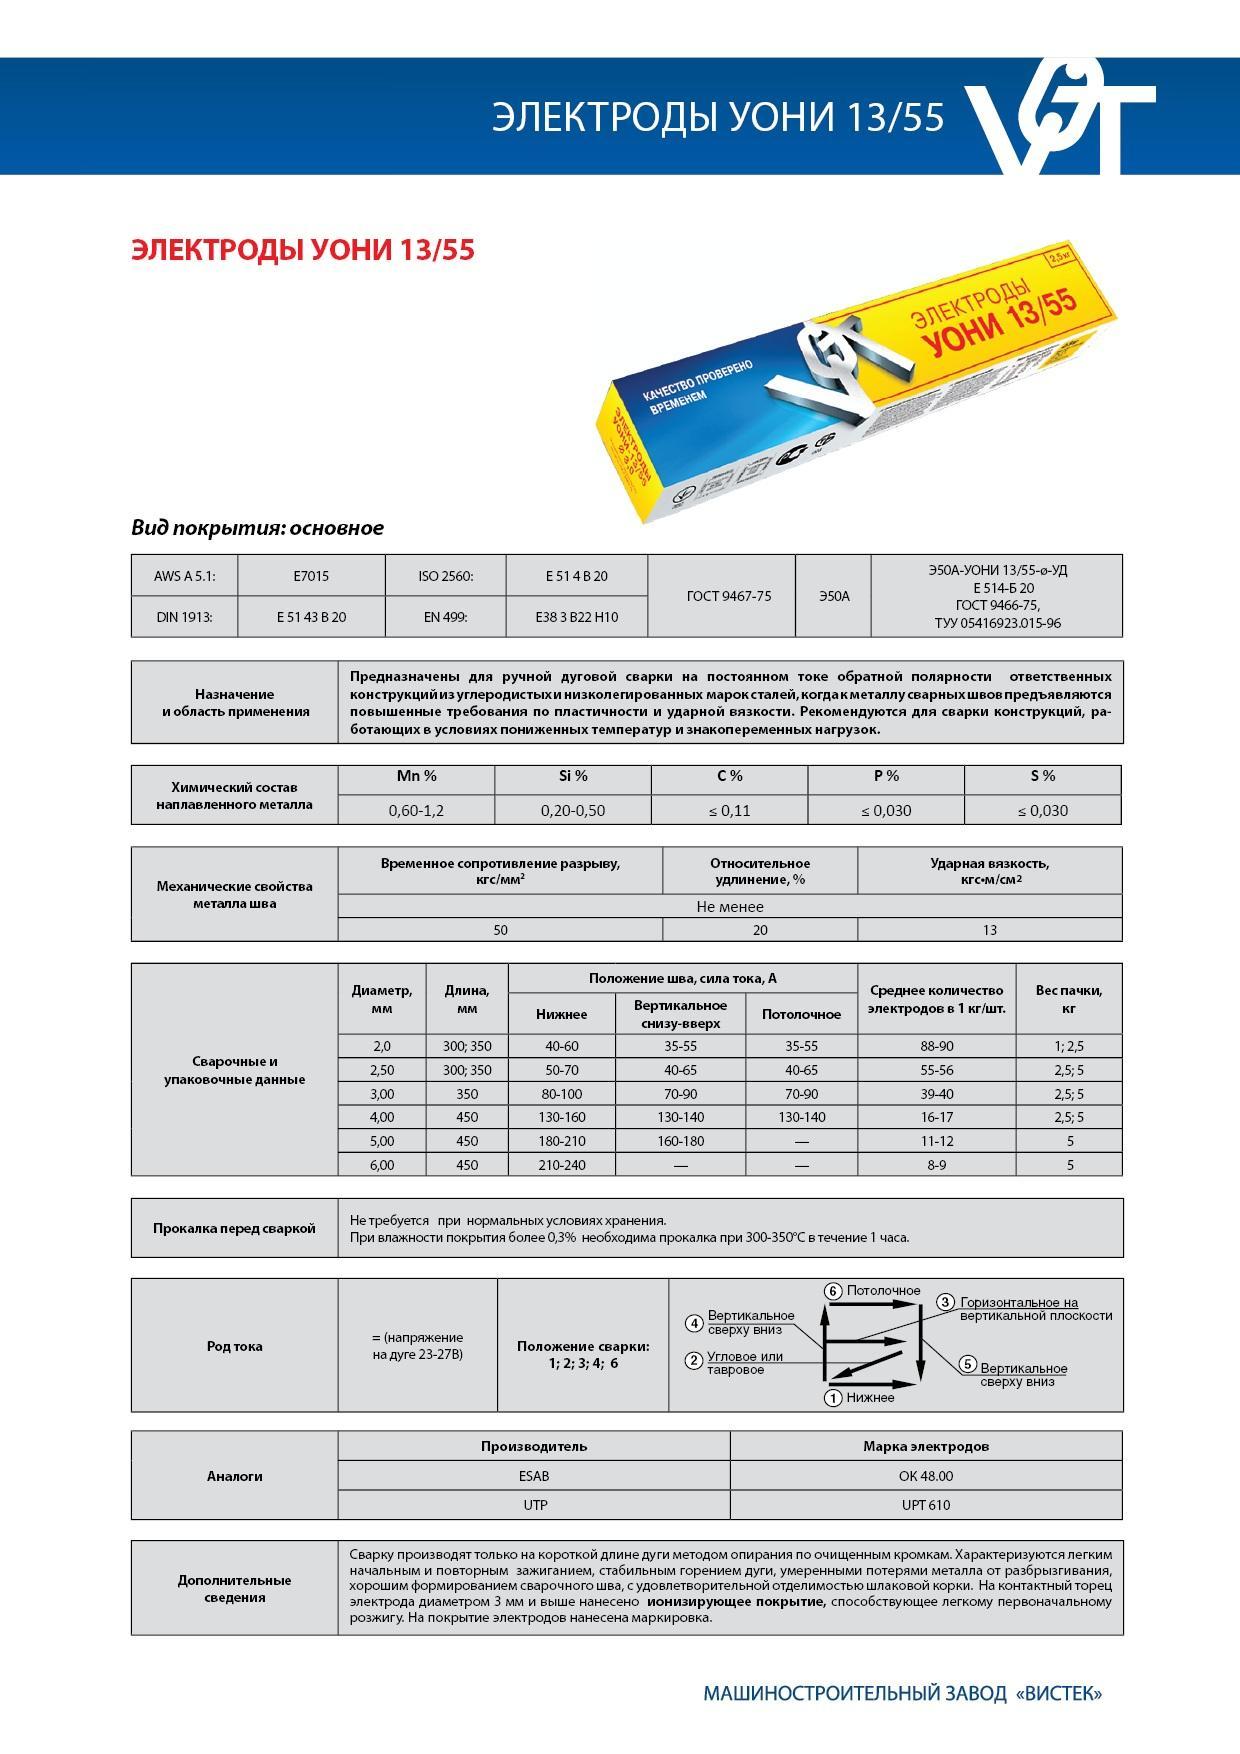 Характеристики и особенности электродов э42